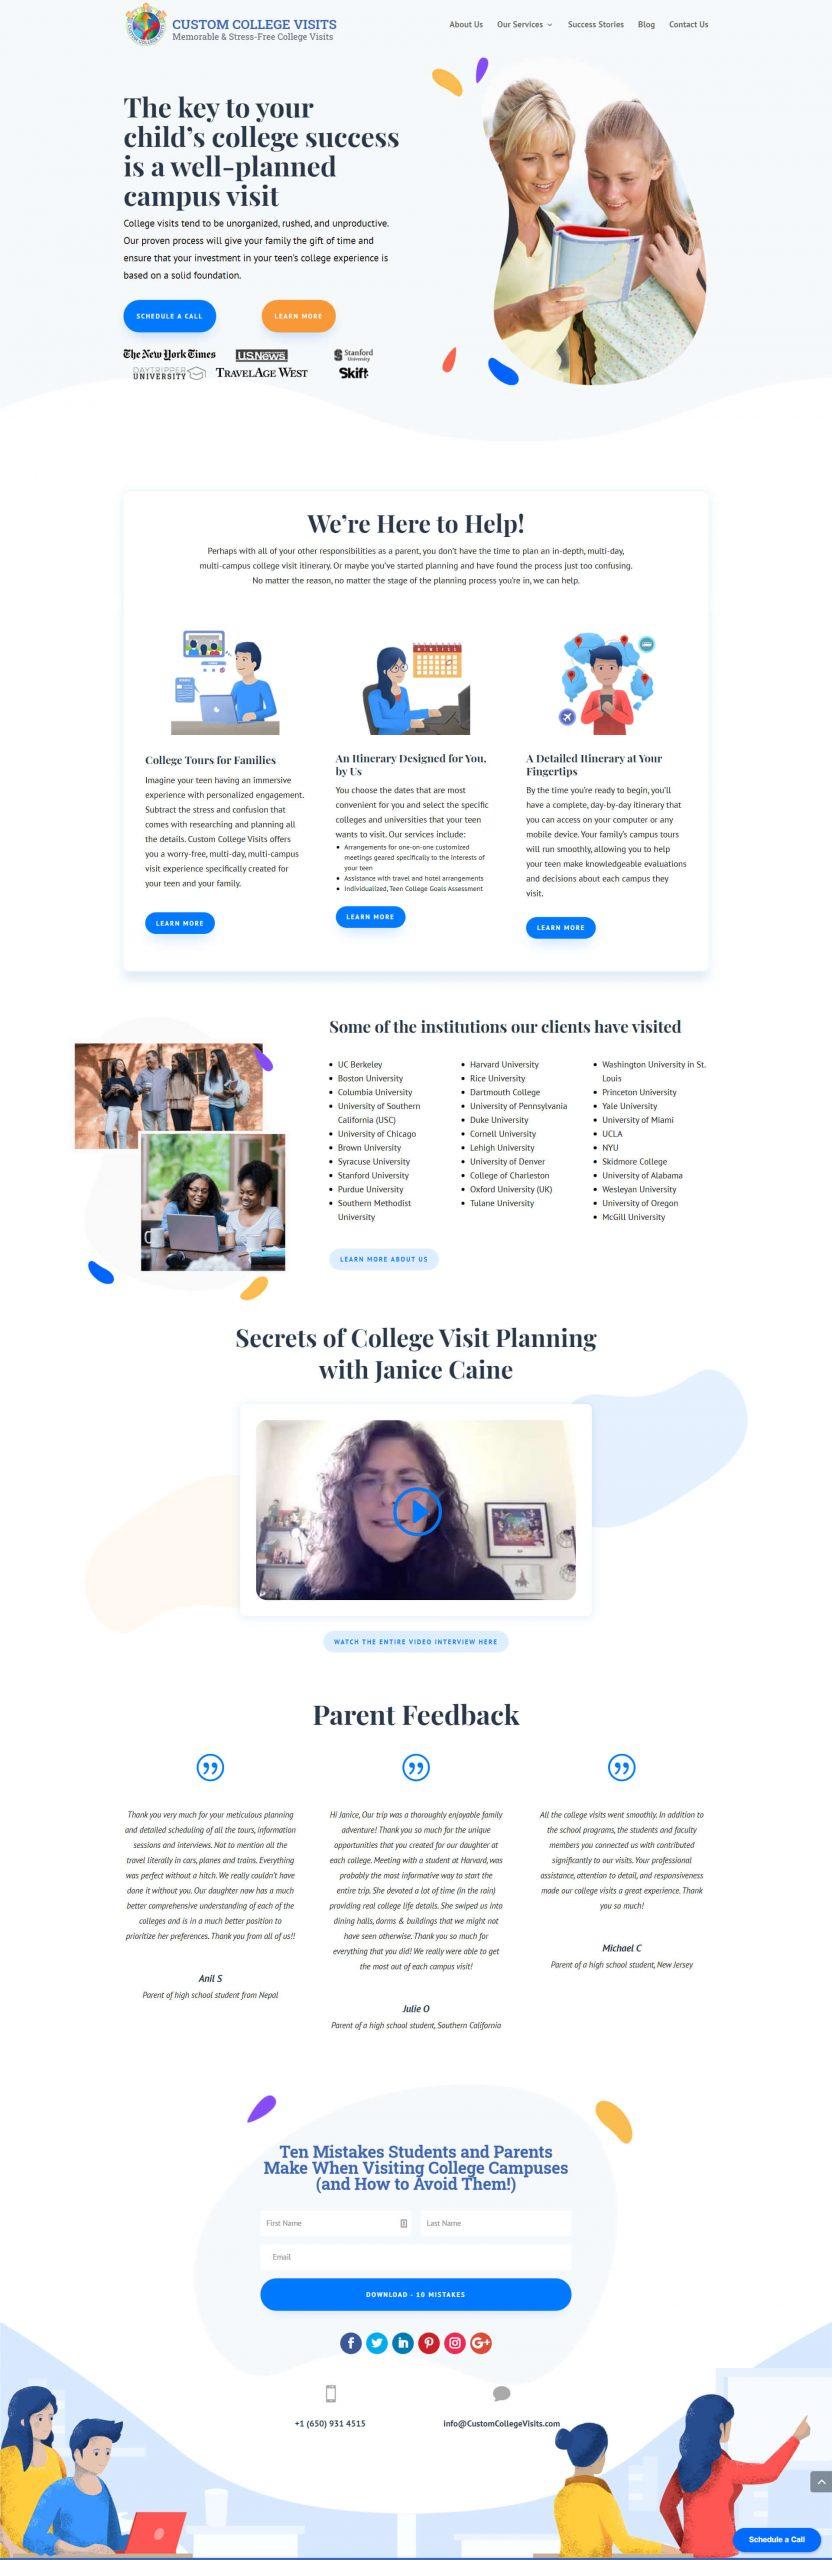 Custom College Visits Homepage